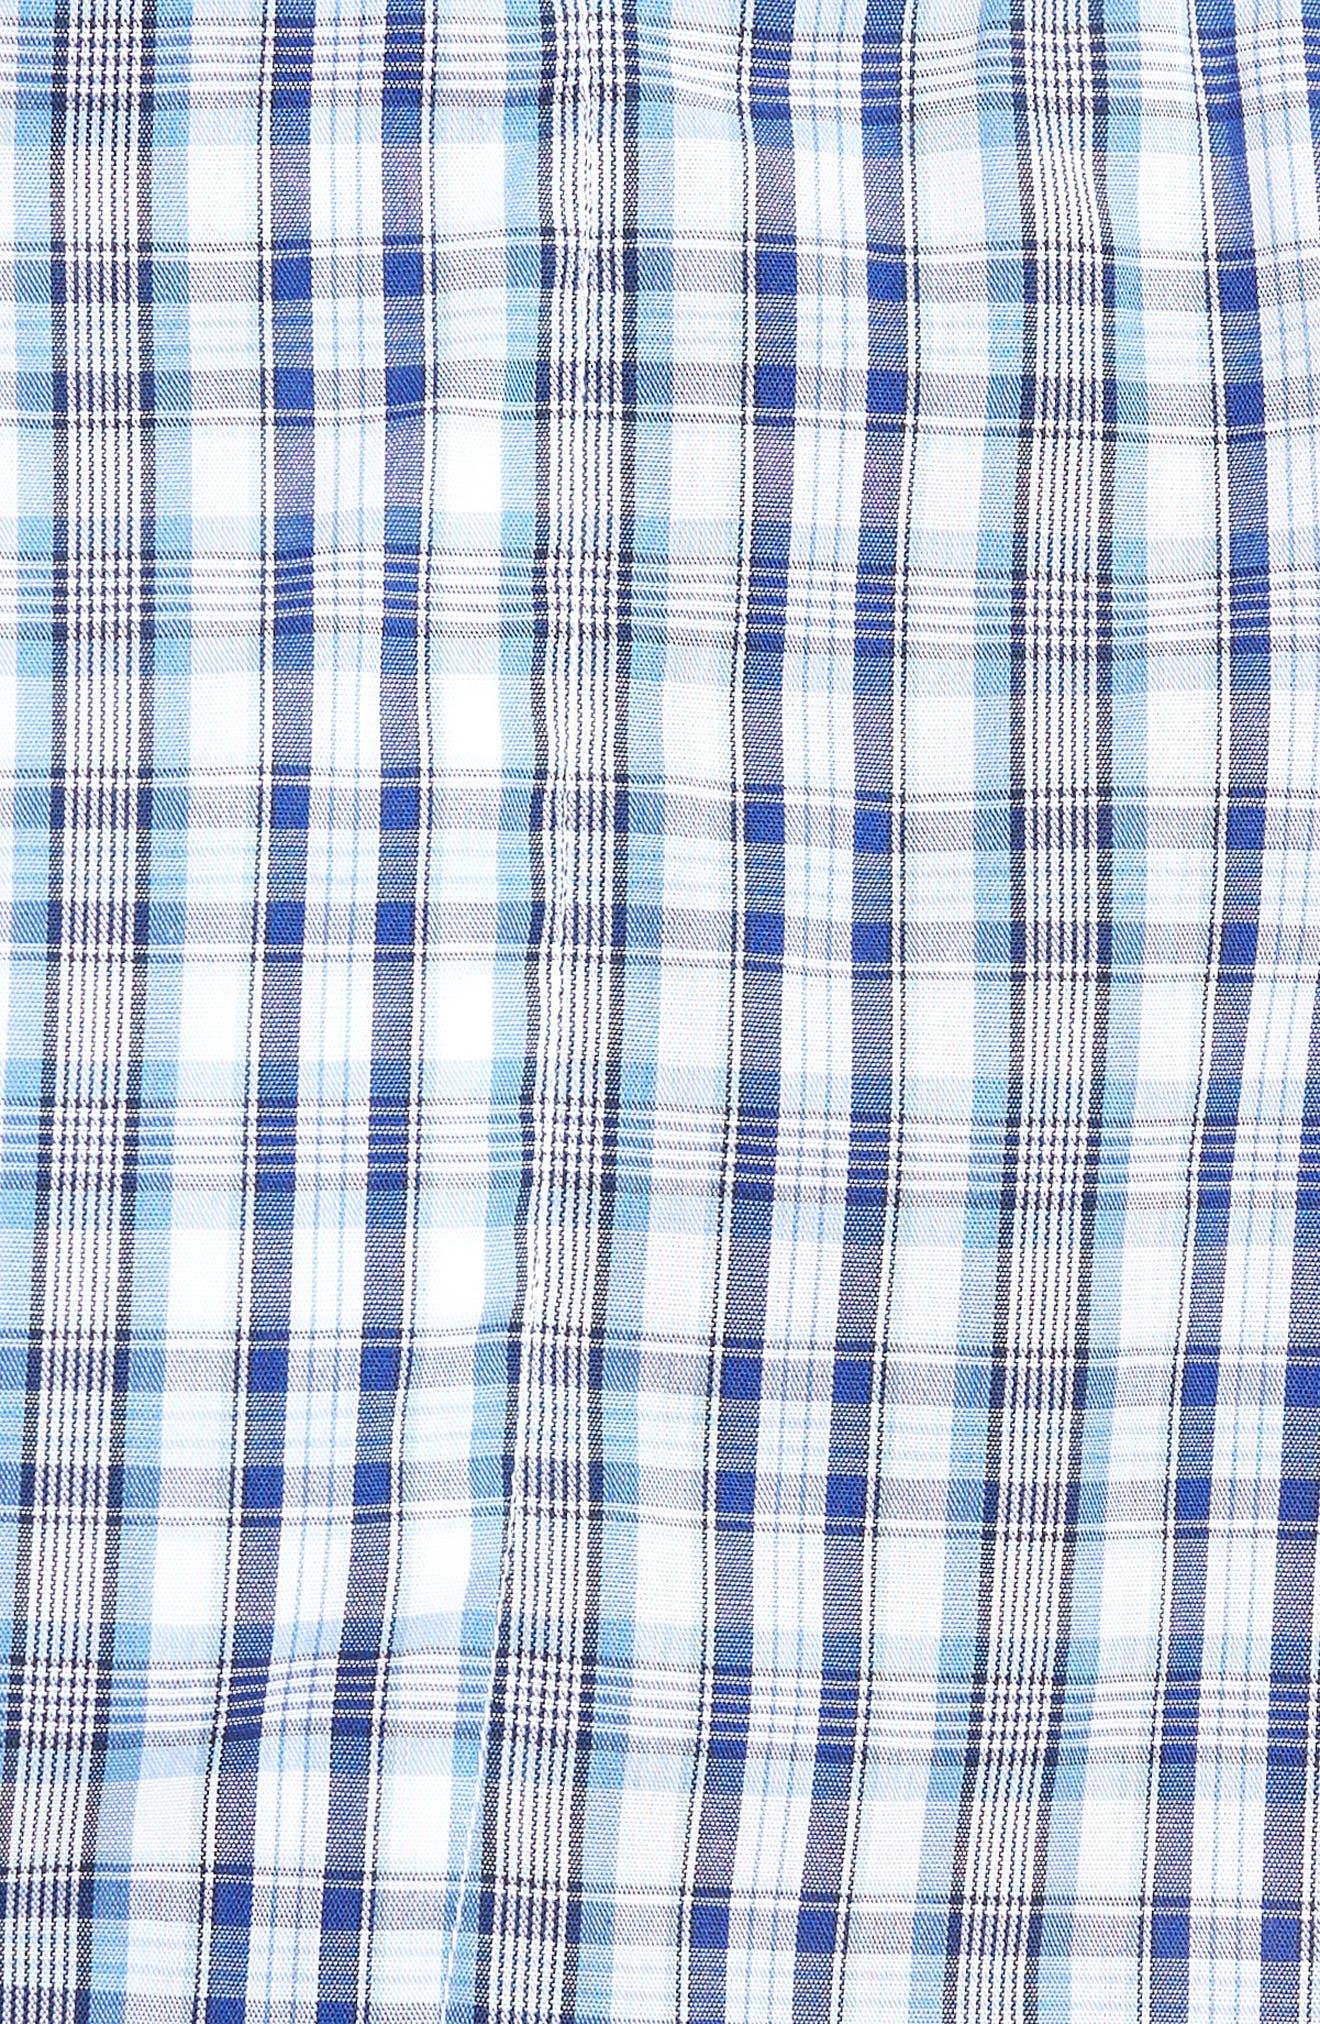 3-Pack Classic Fit Boxers,                             Alternate thumbnail 6, color,                             BLUE DAZZLE SOLID- PLAID PACK